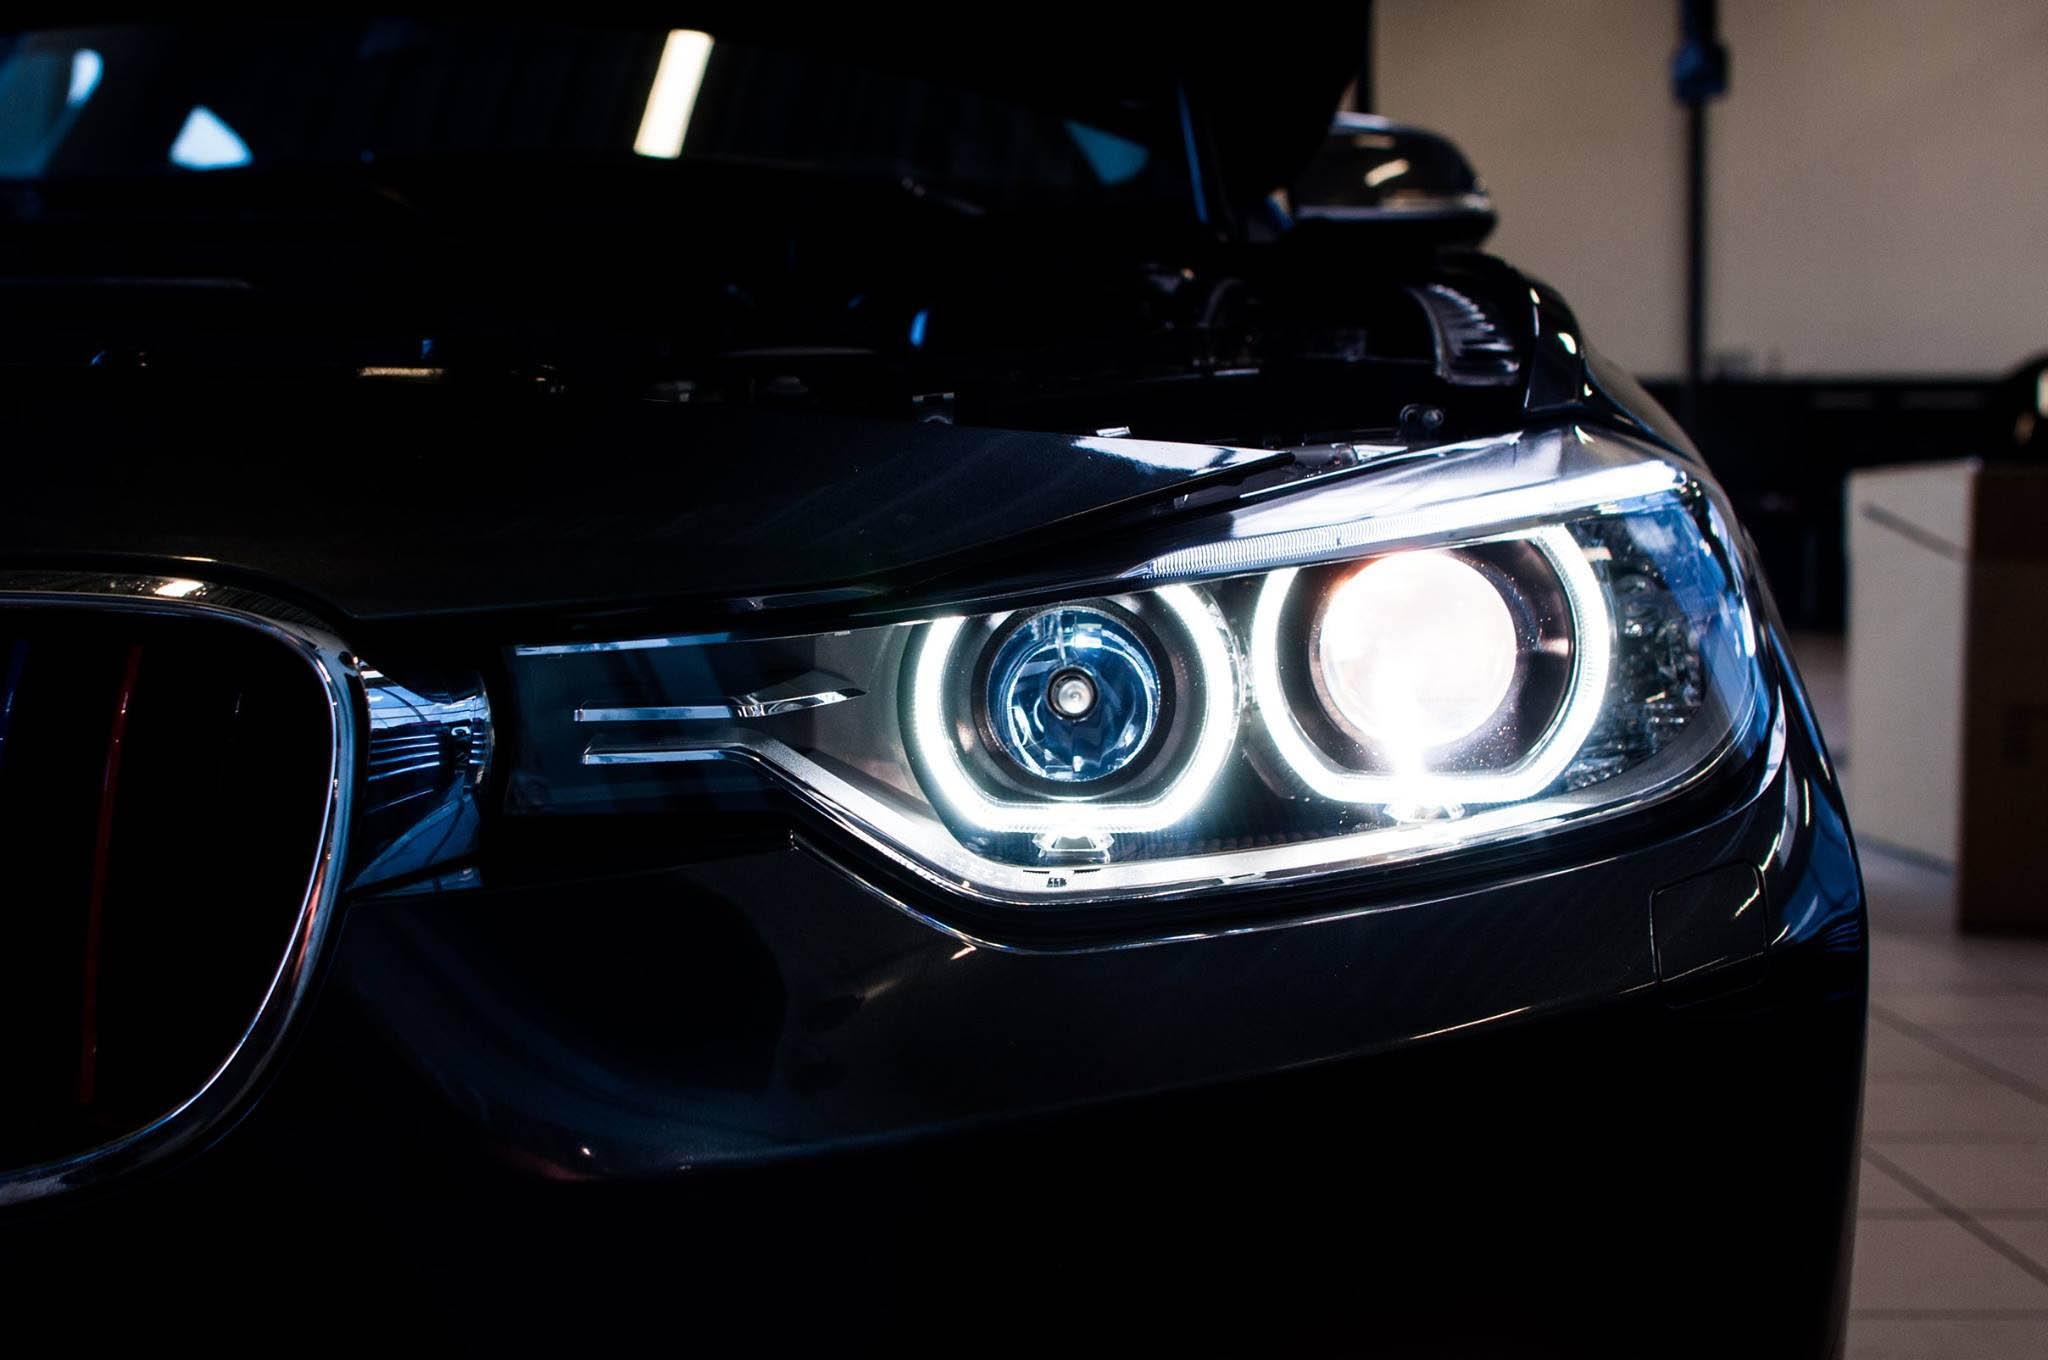 depo-bmw-xenon-projector-f30-f31-angel-eyes-headlights-uk-1.jpg